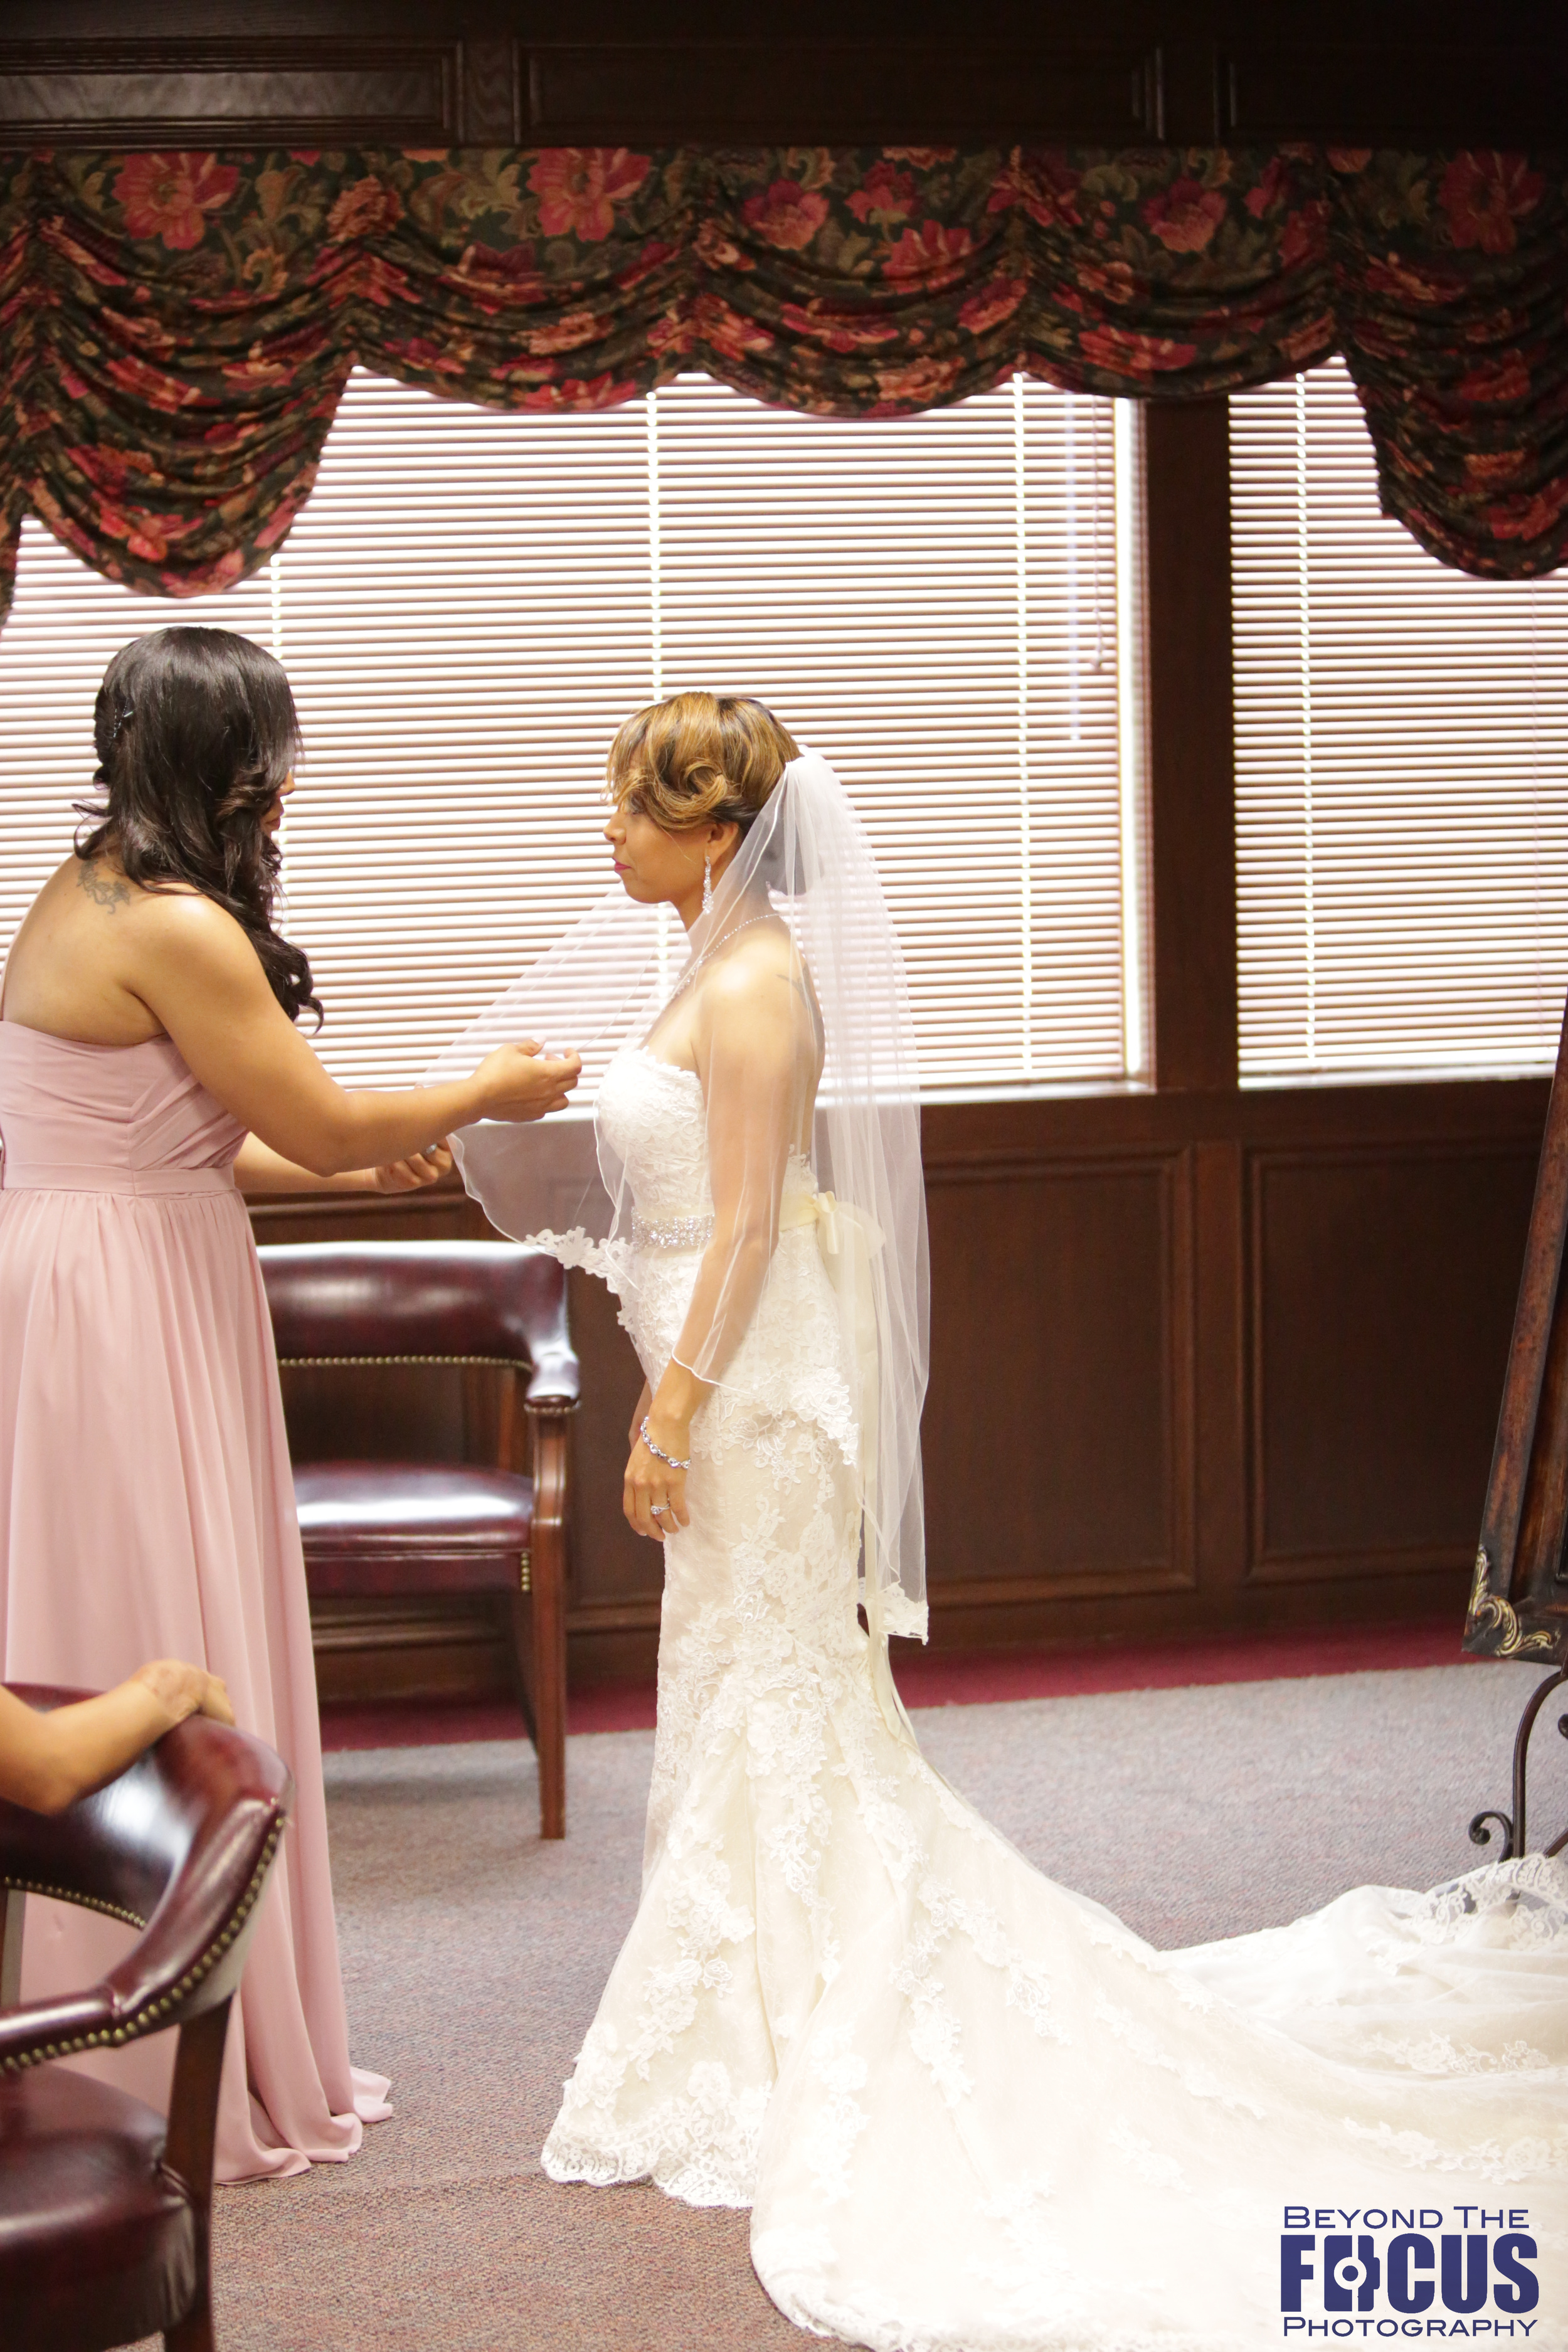 Palmer Wedding - Candids36.jpg